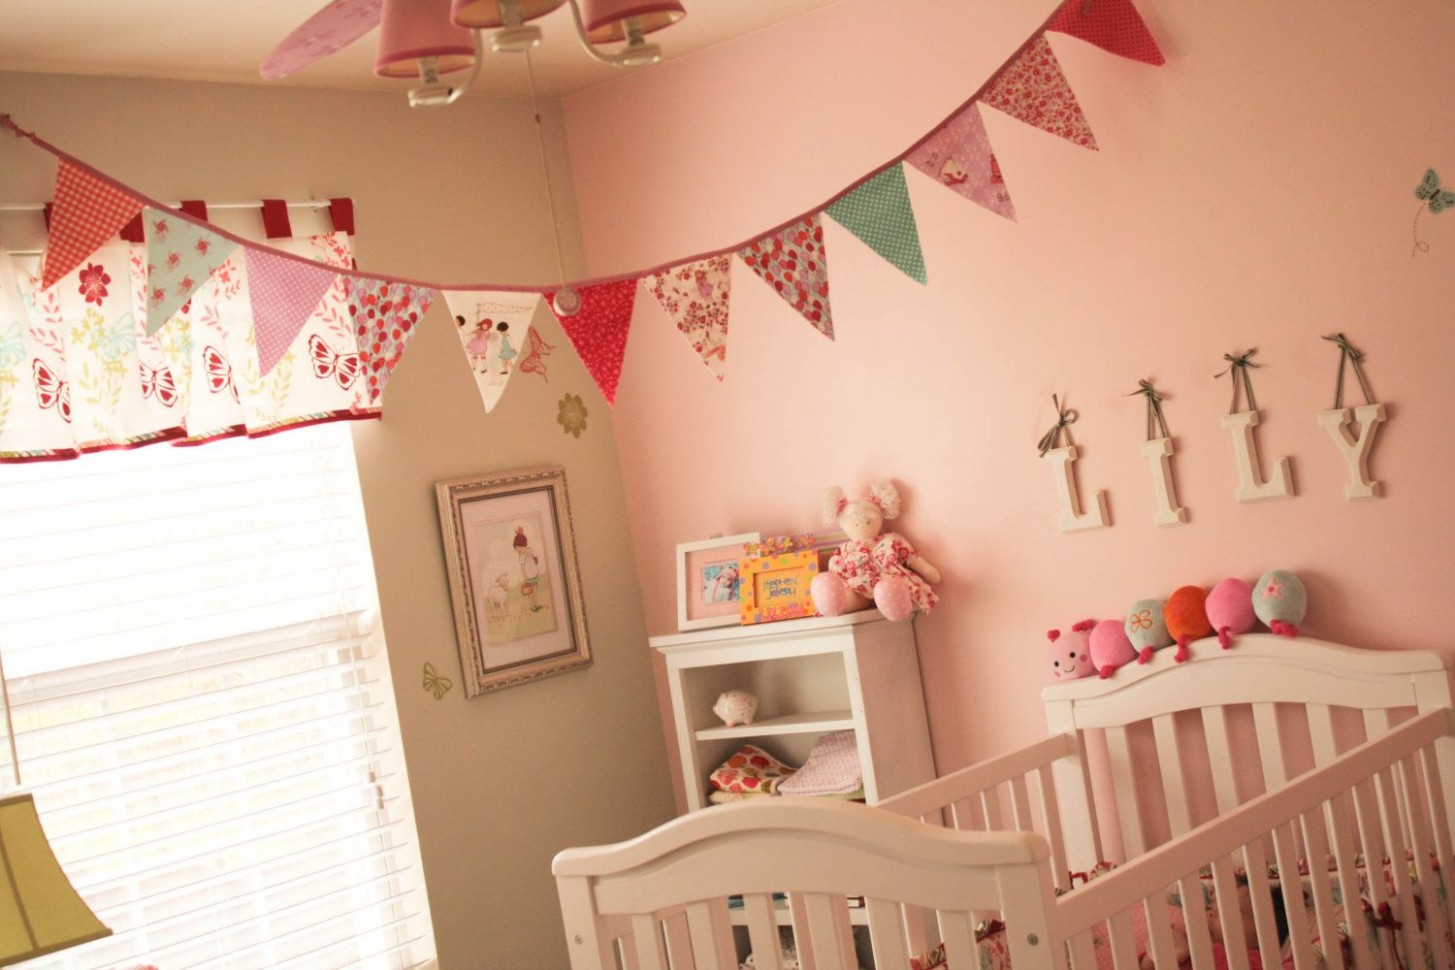 Fabric Bunting  Kid room decor, Nursery bunting, Fabric banner - Baby Room Bunting